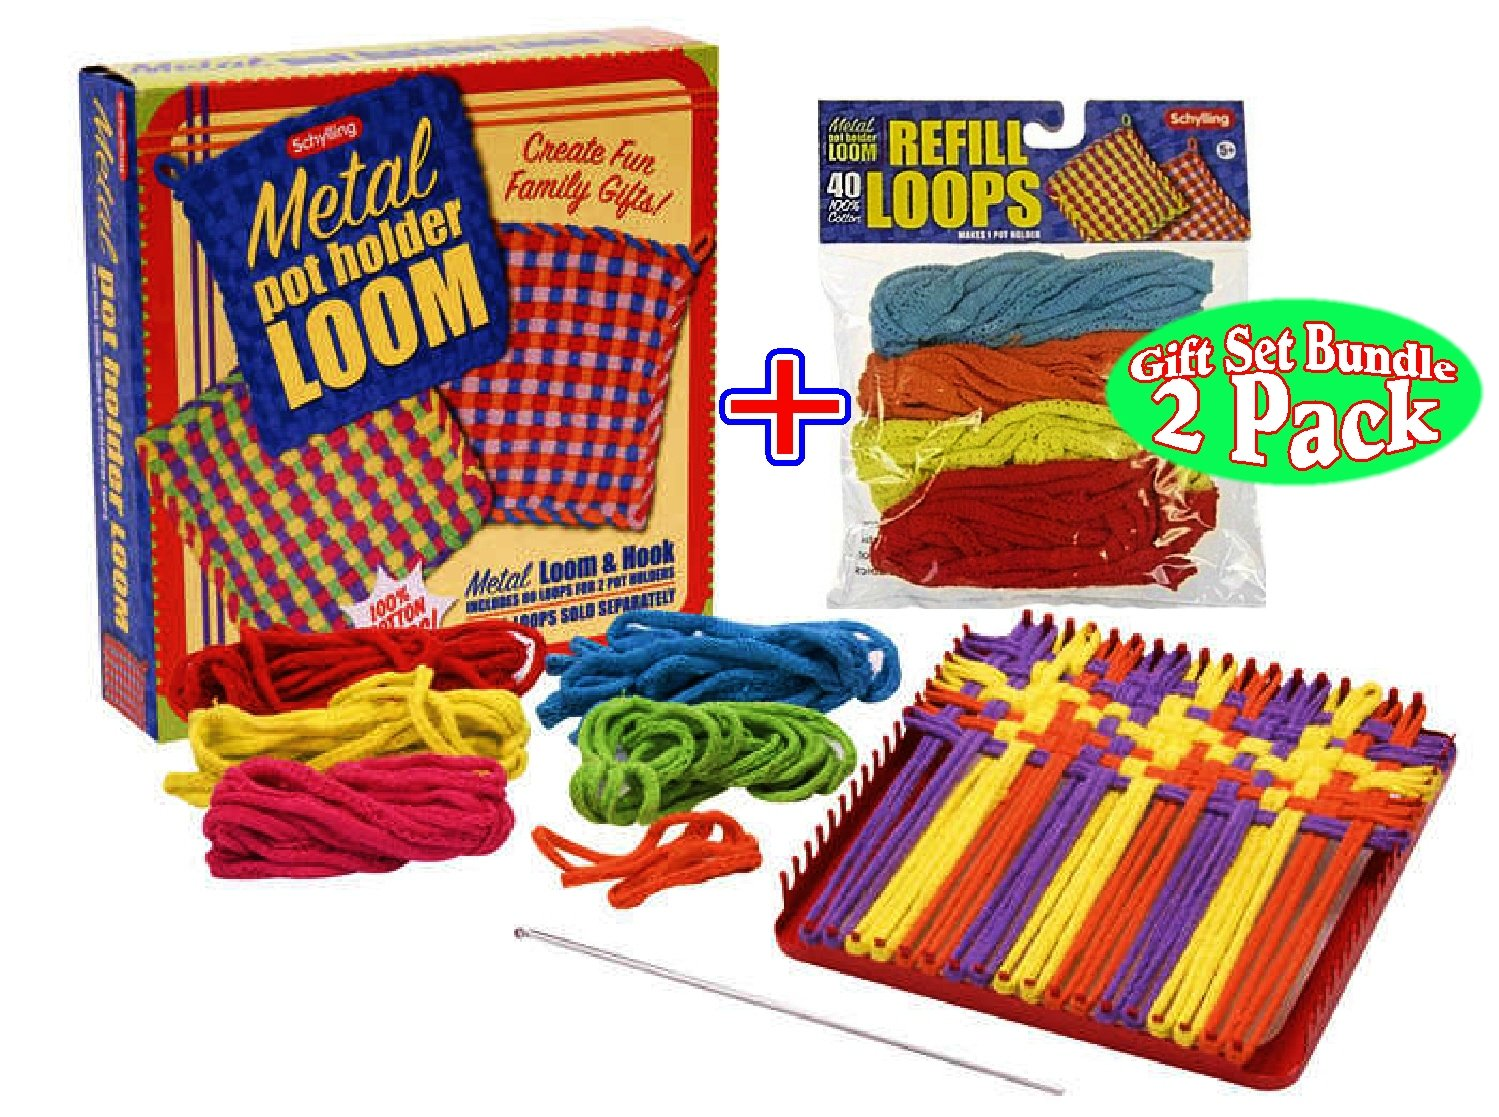 Schylling Metal Pot Holder Loom Kit & 40 Loop Refills Gift Set Bundle (Colors May Vary)